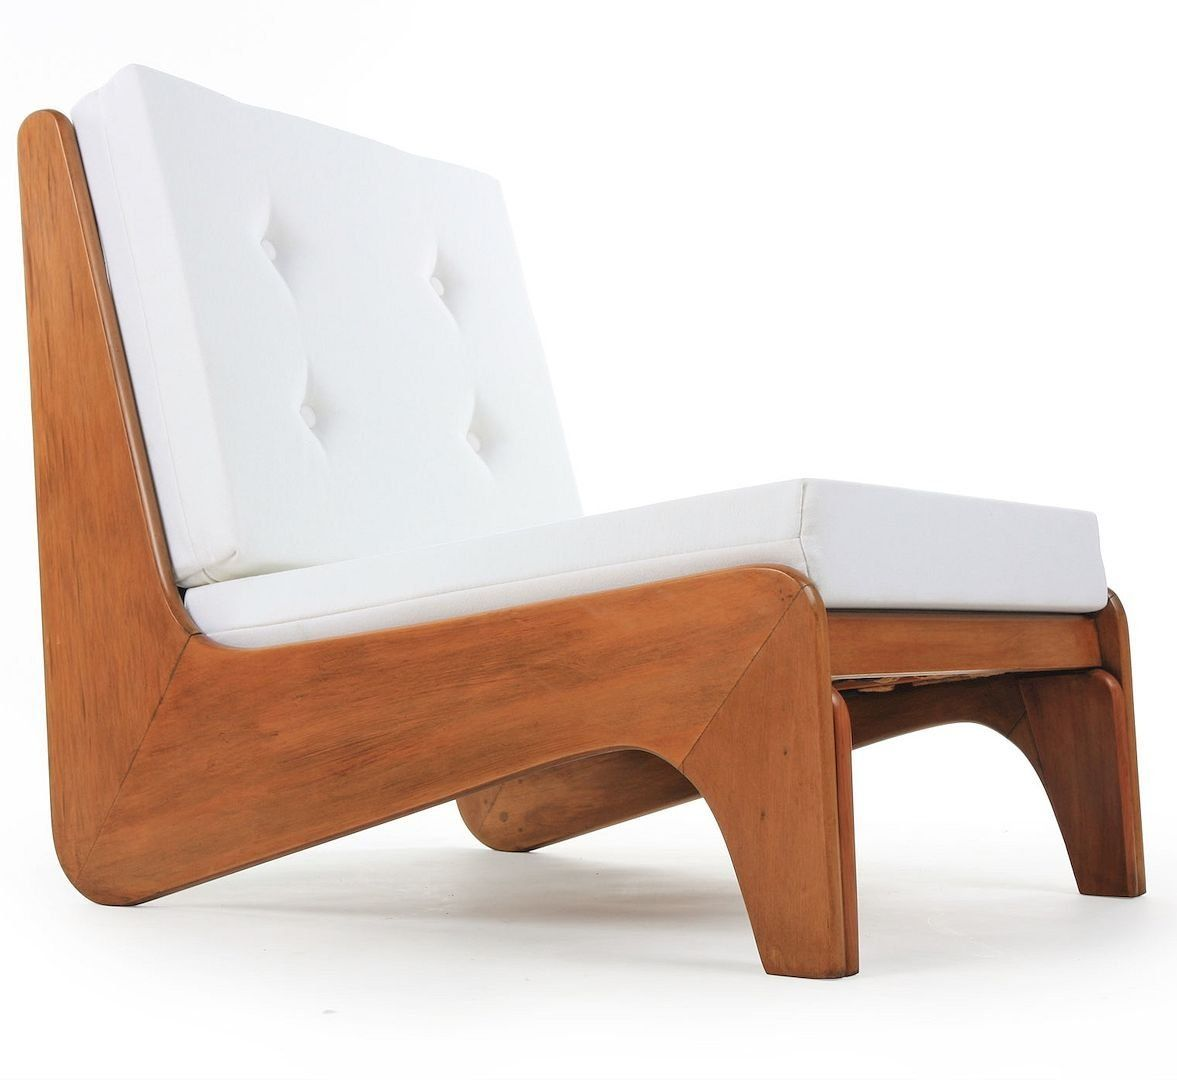 Where Can You Get Cheap Furniture: 47 Best Modern Furniture Ideas 2017